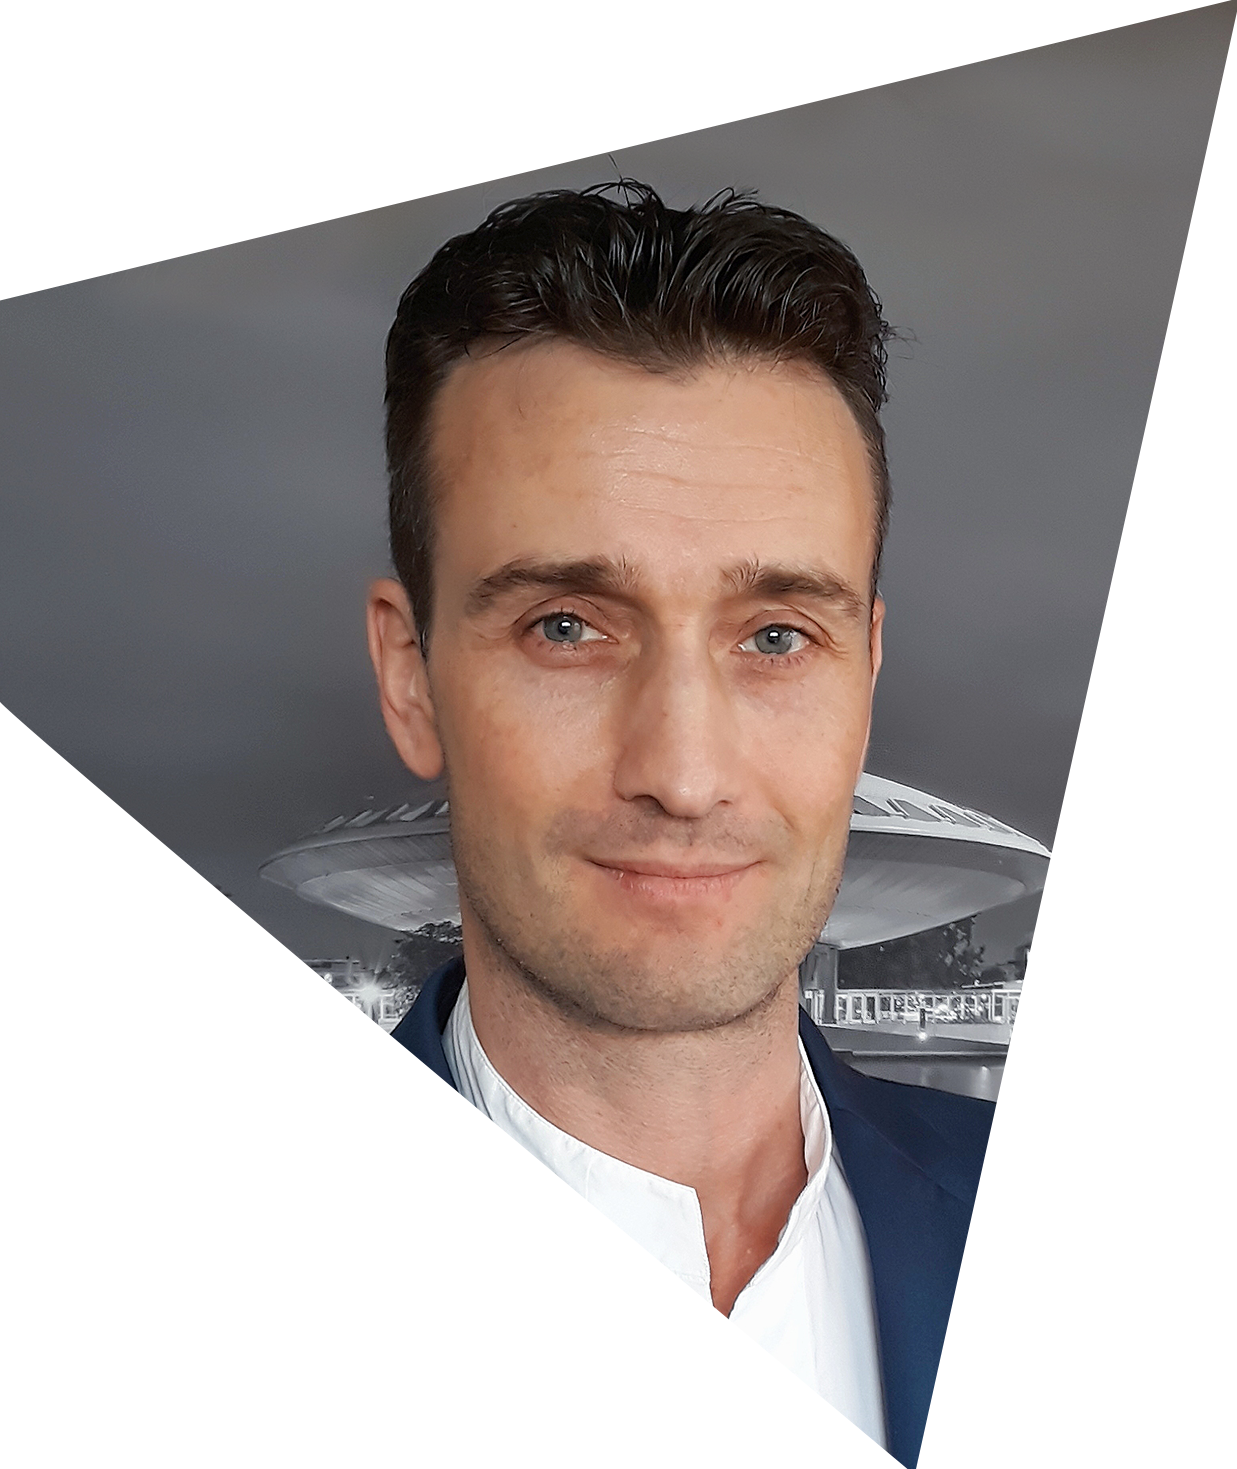 https://www.lef-academy.nl/wp-content/uploads/2020/05/Egbertdriehoek.png